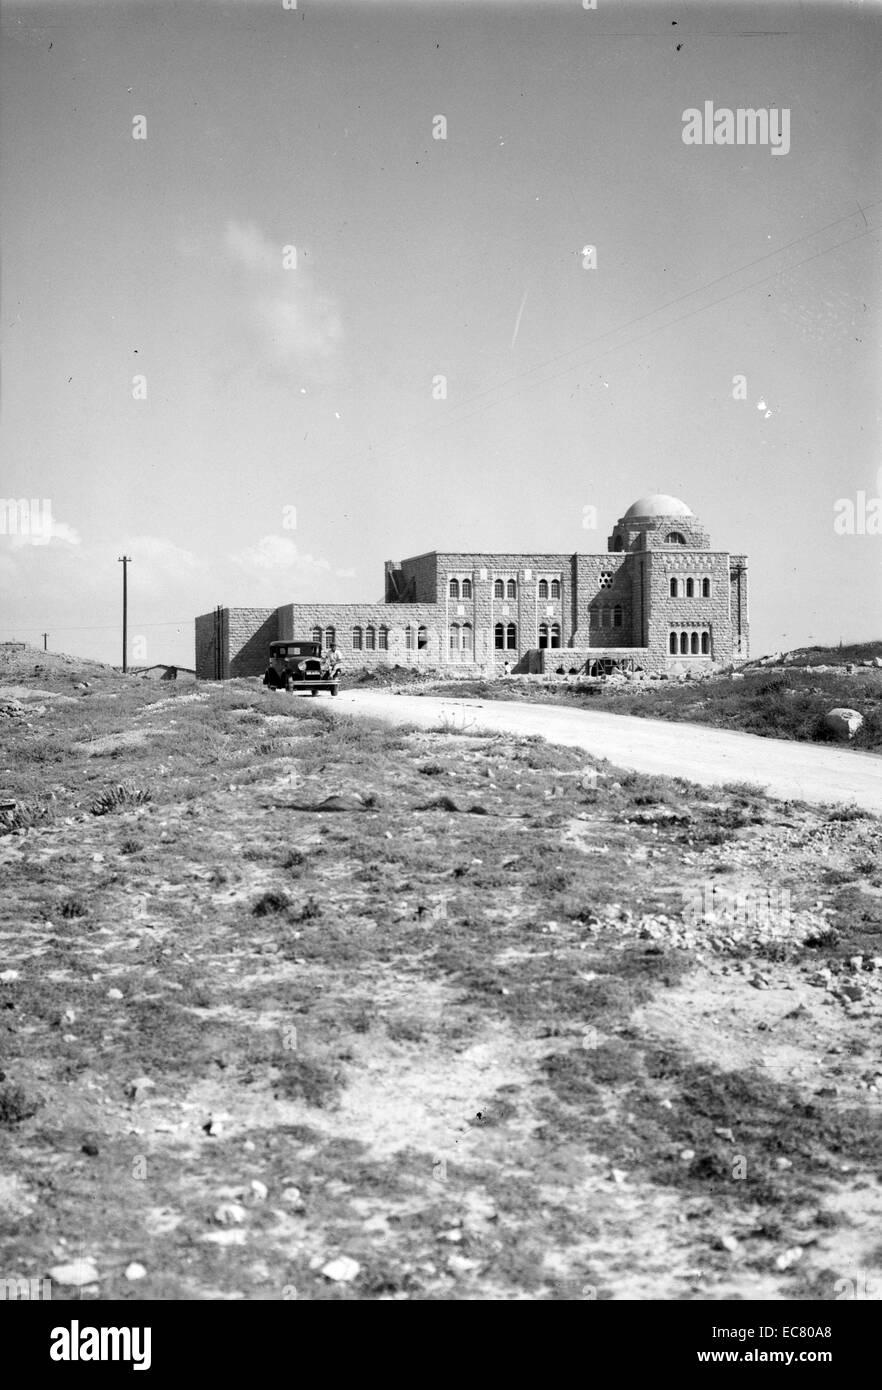 The Hebrew University Library; Jerusalem during the british Mandate period 1932 - Stock Image